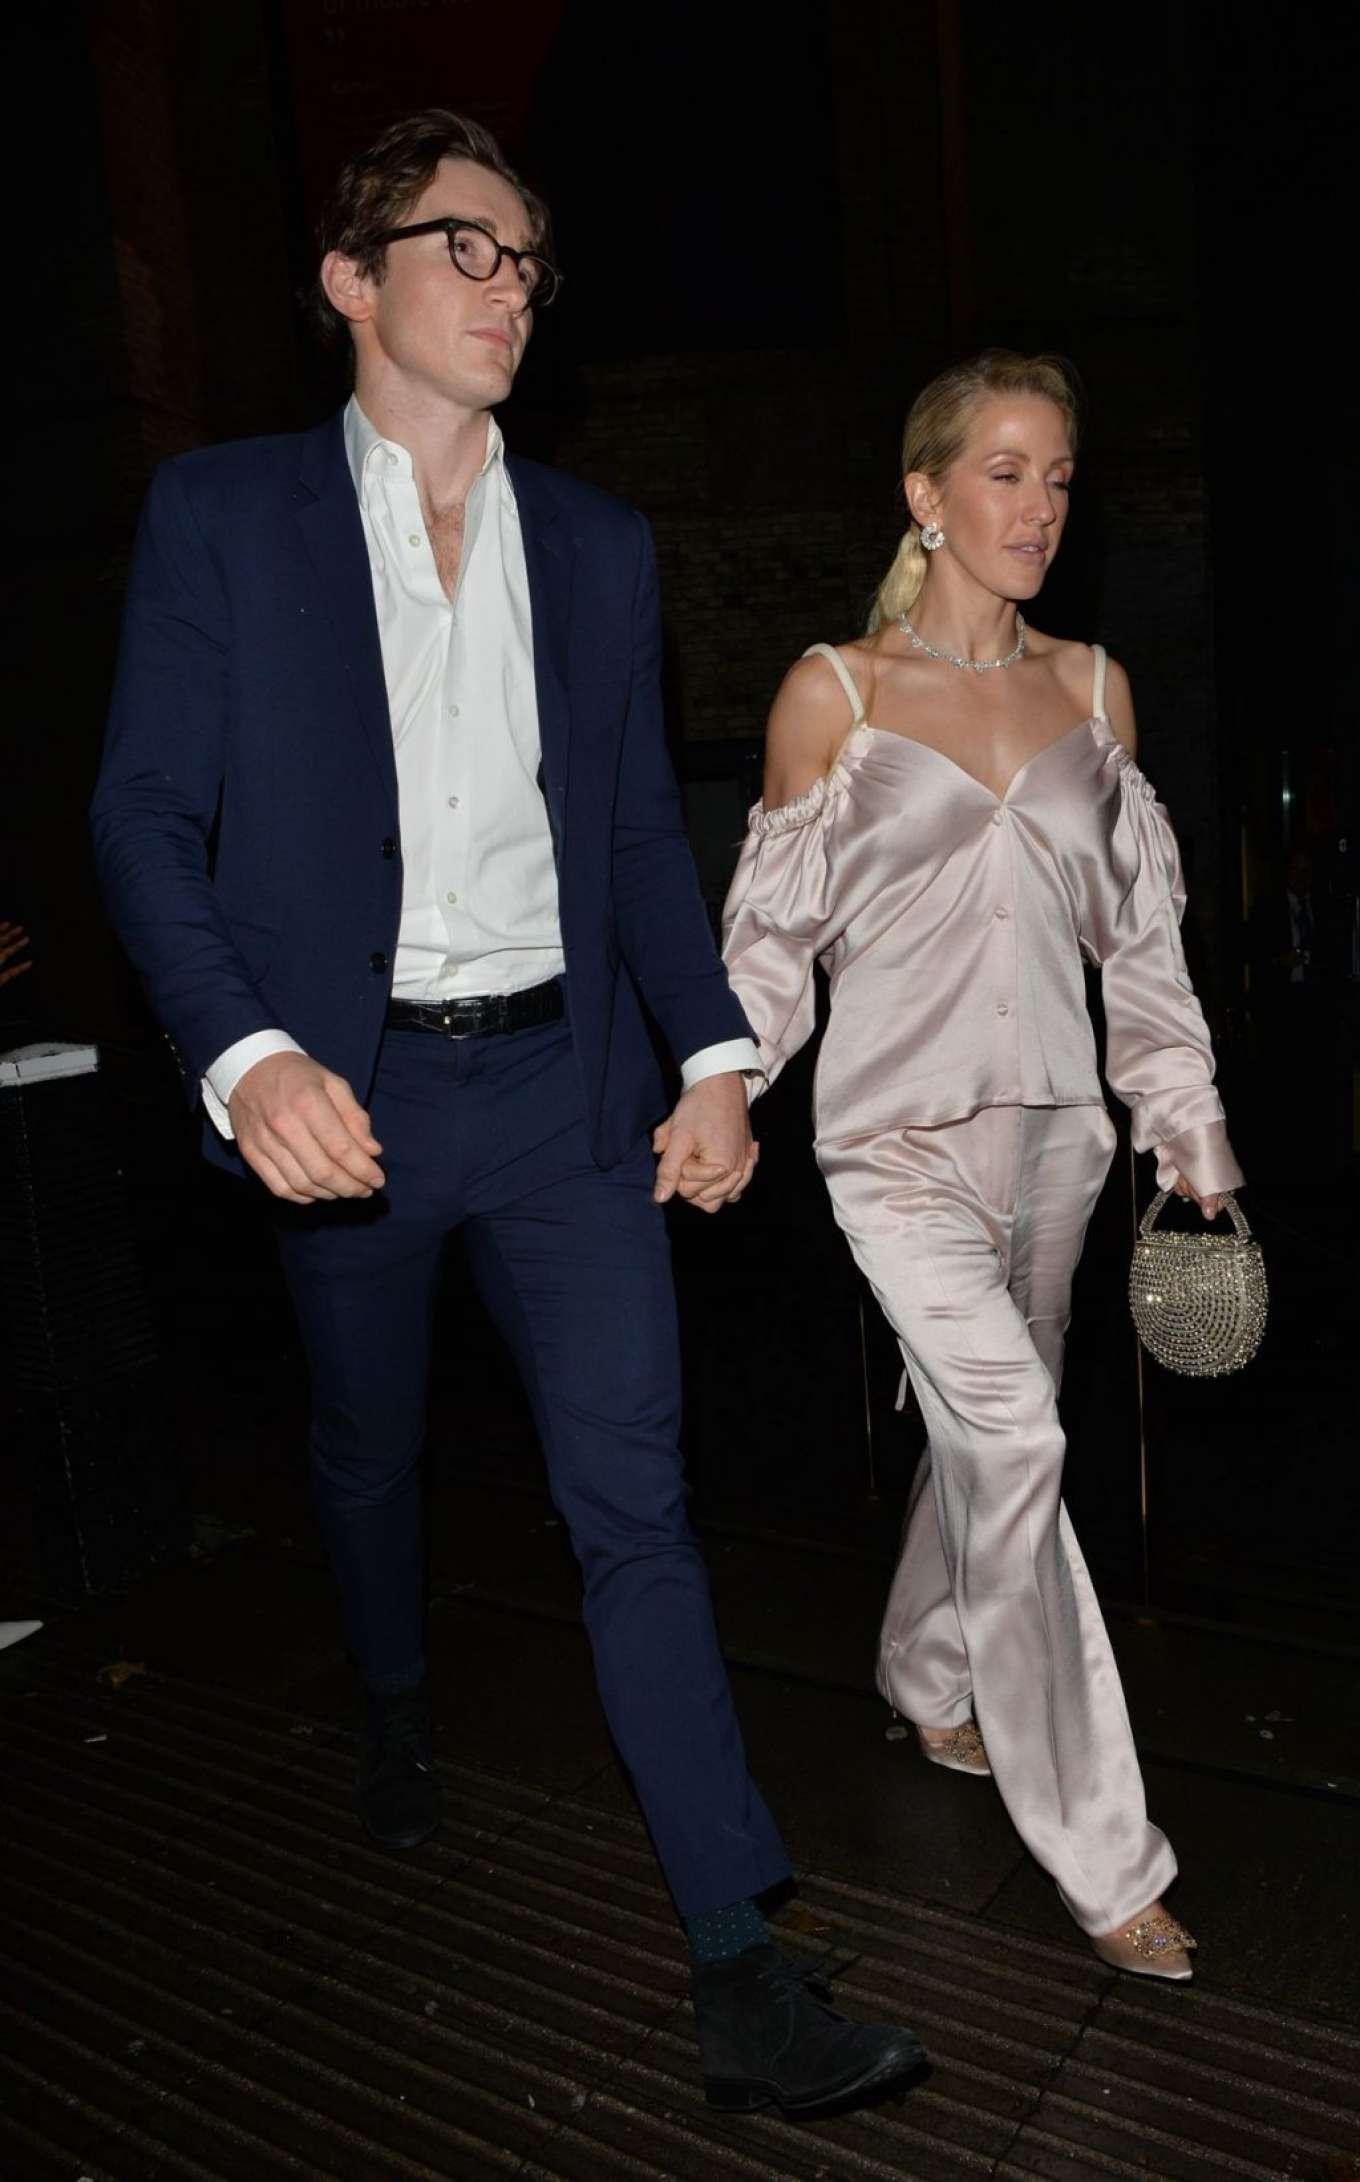 Ellie Goulding 2019 : Ellie Goulding and her husband Jaspar Copling were seen leaving the Roundhouse in Camden – London-22